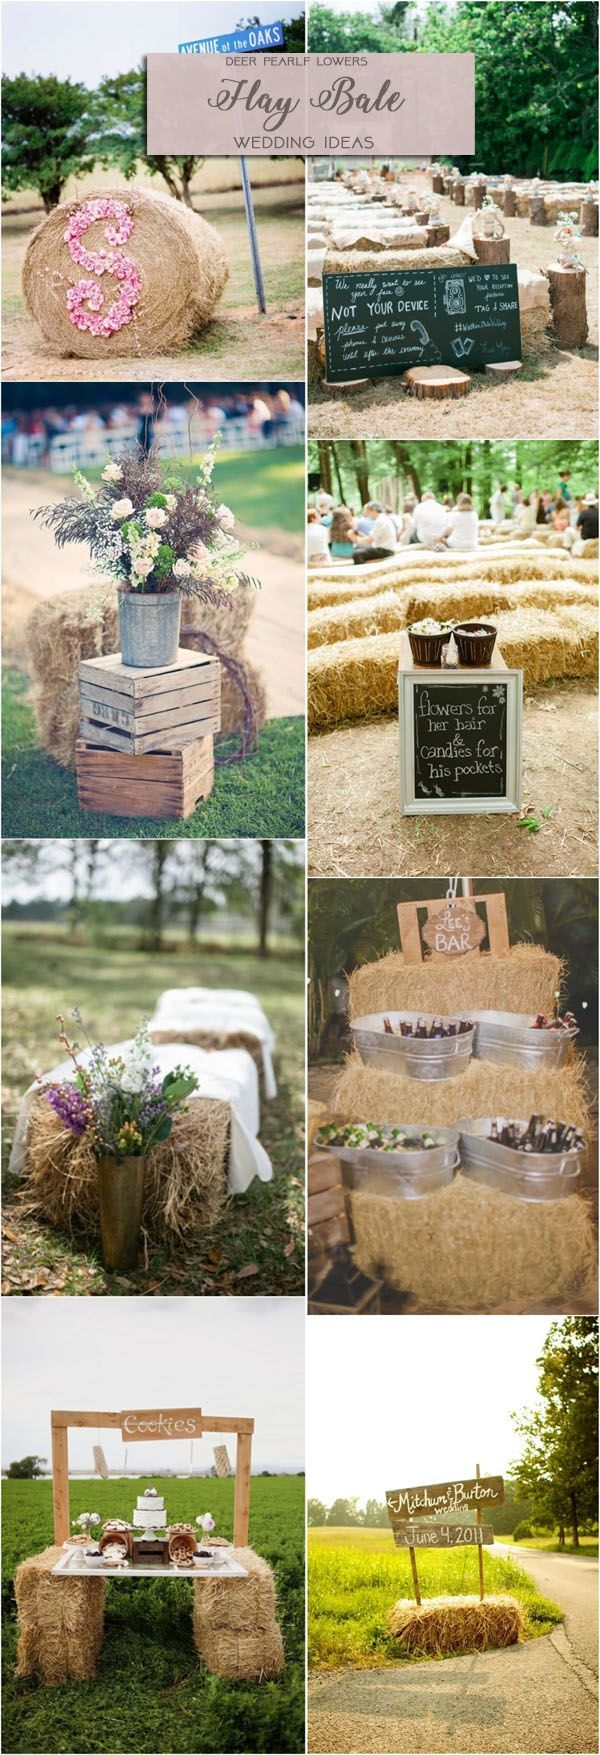 Rustic country farm hay bale wedding ideas / http://www.deerpearlflowers.com/rustic-wedding-themes-ideas/